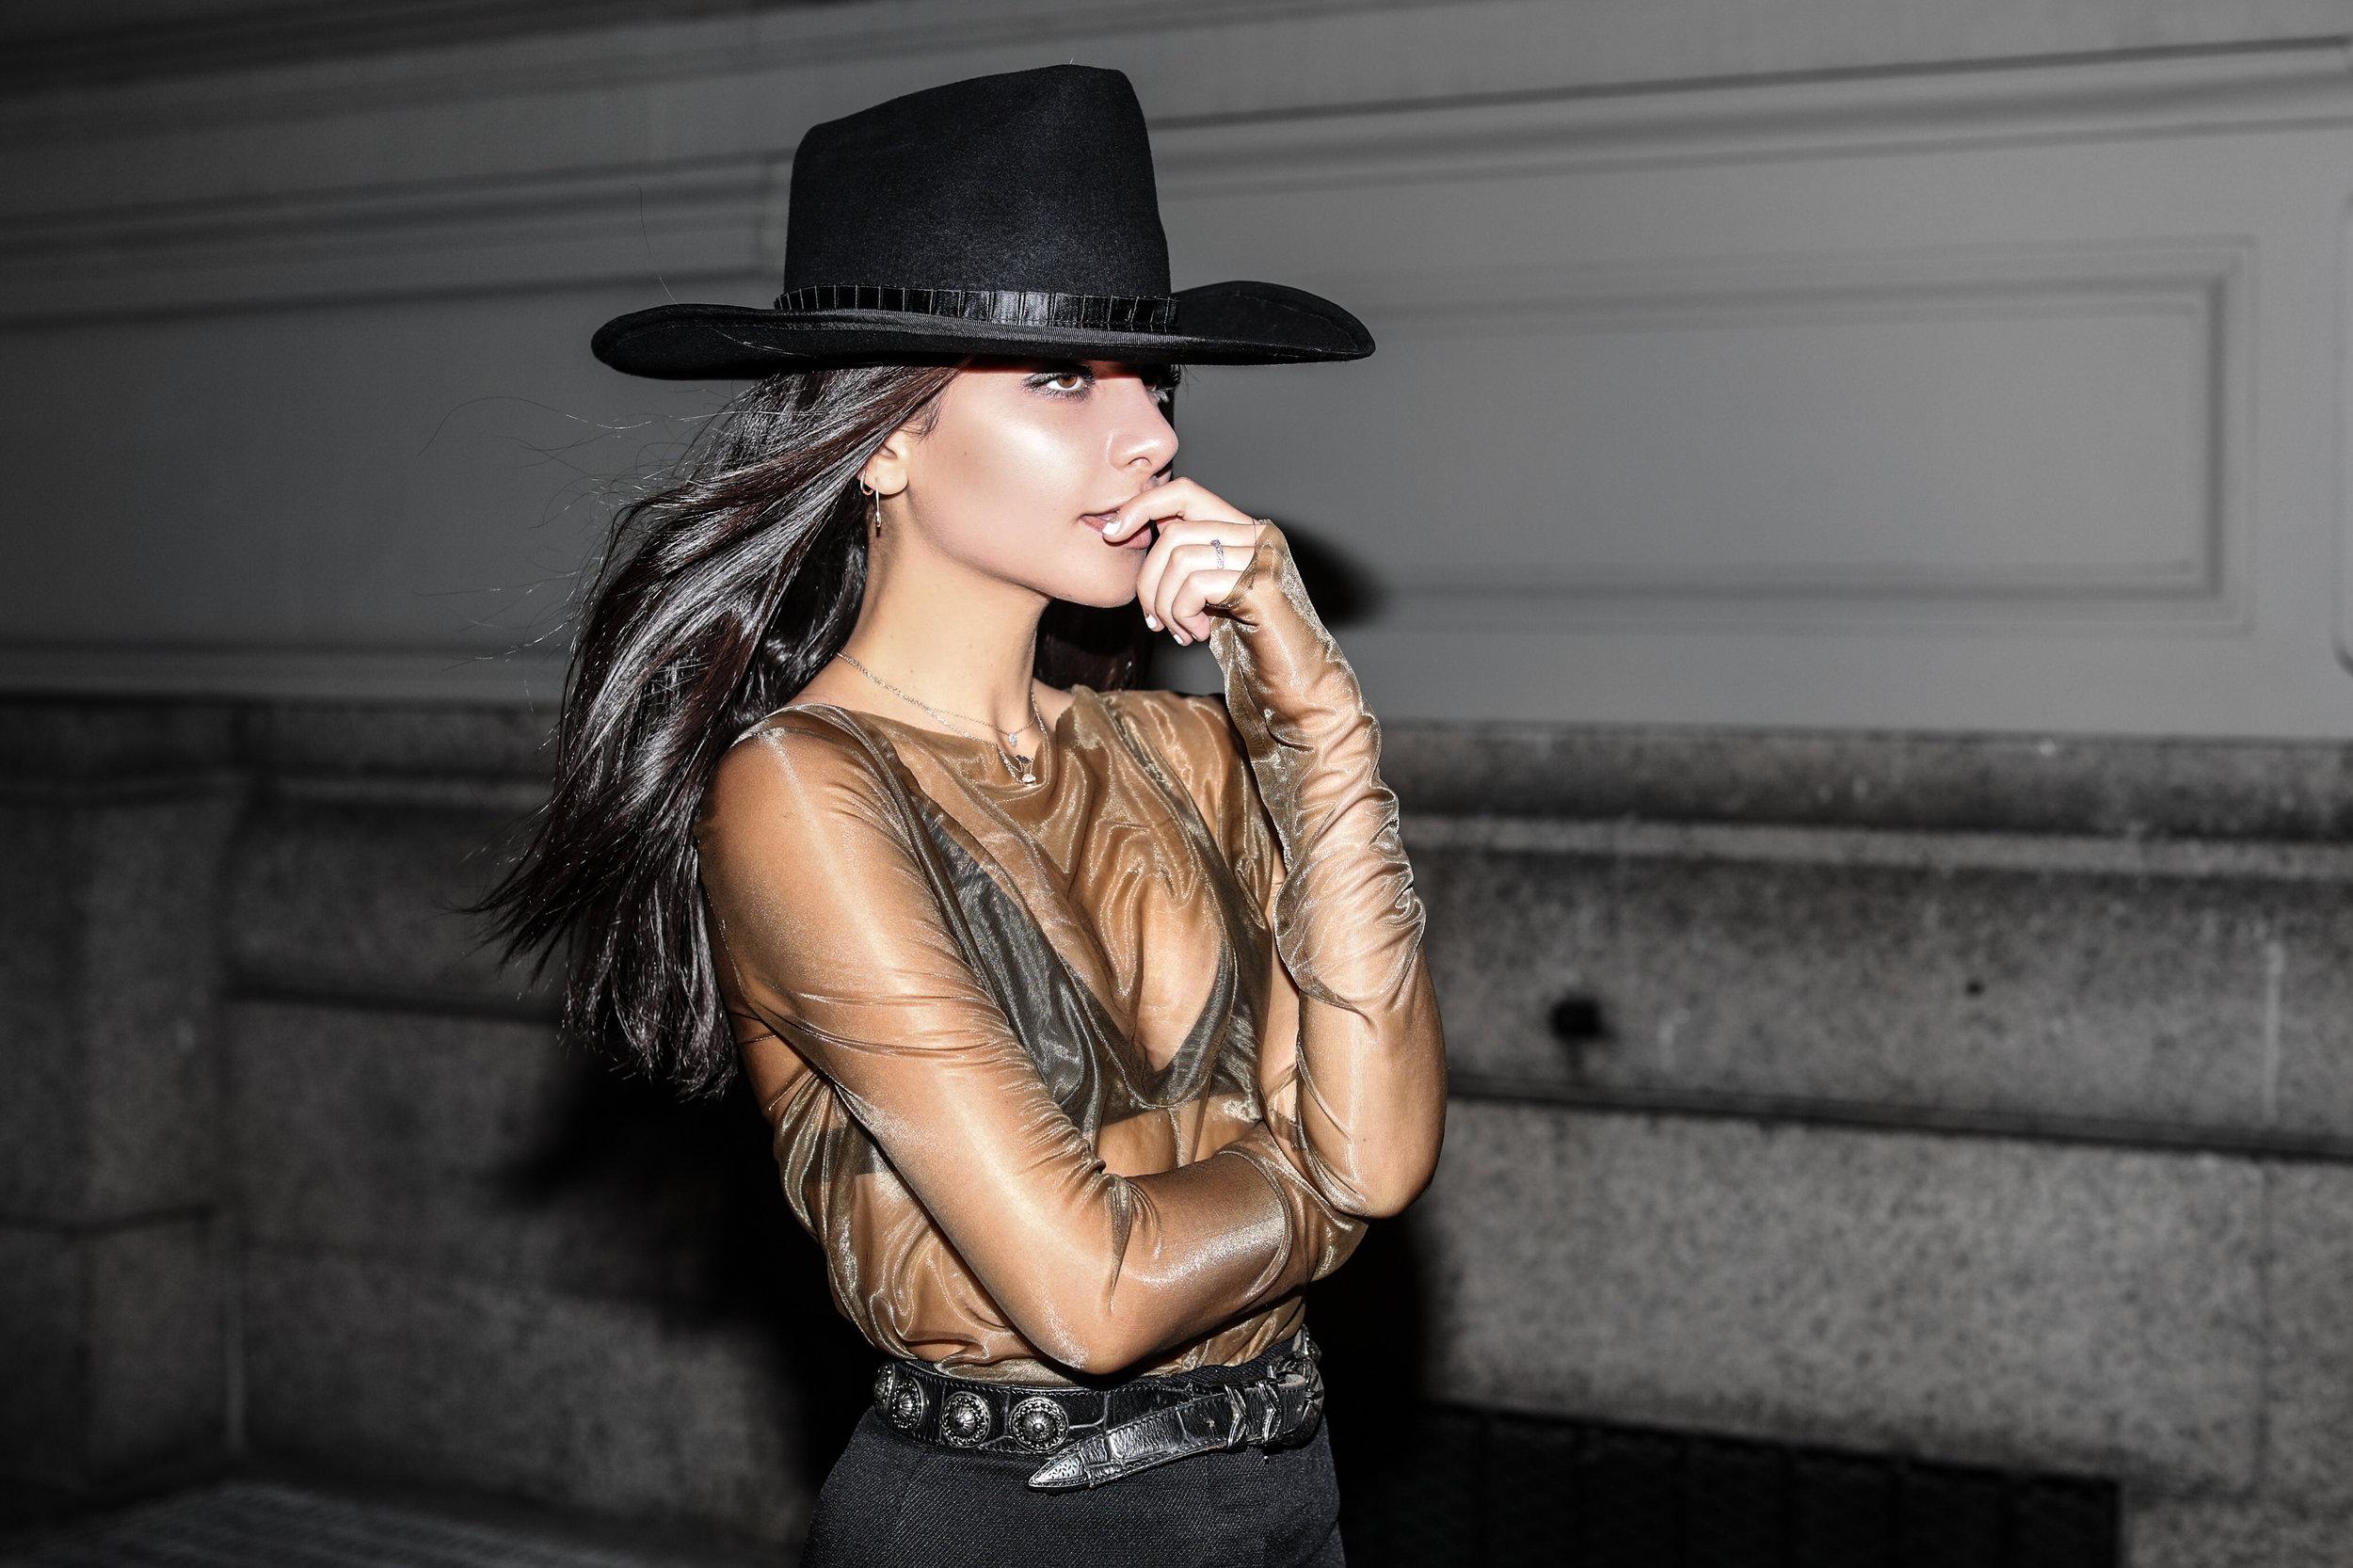 lainy-hedaya-hat-attack-design-collaboration-fashion-blogger.jpg